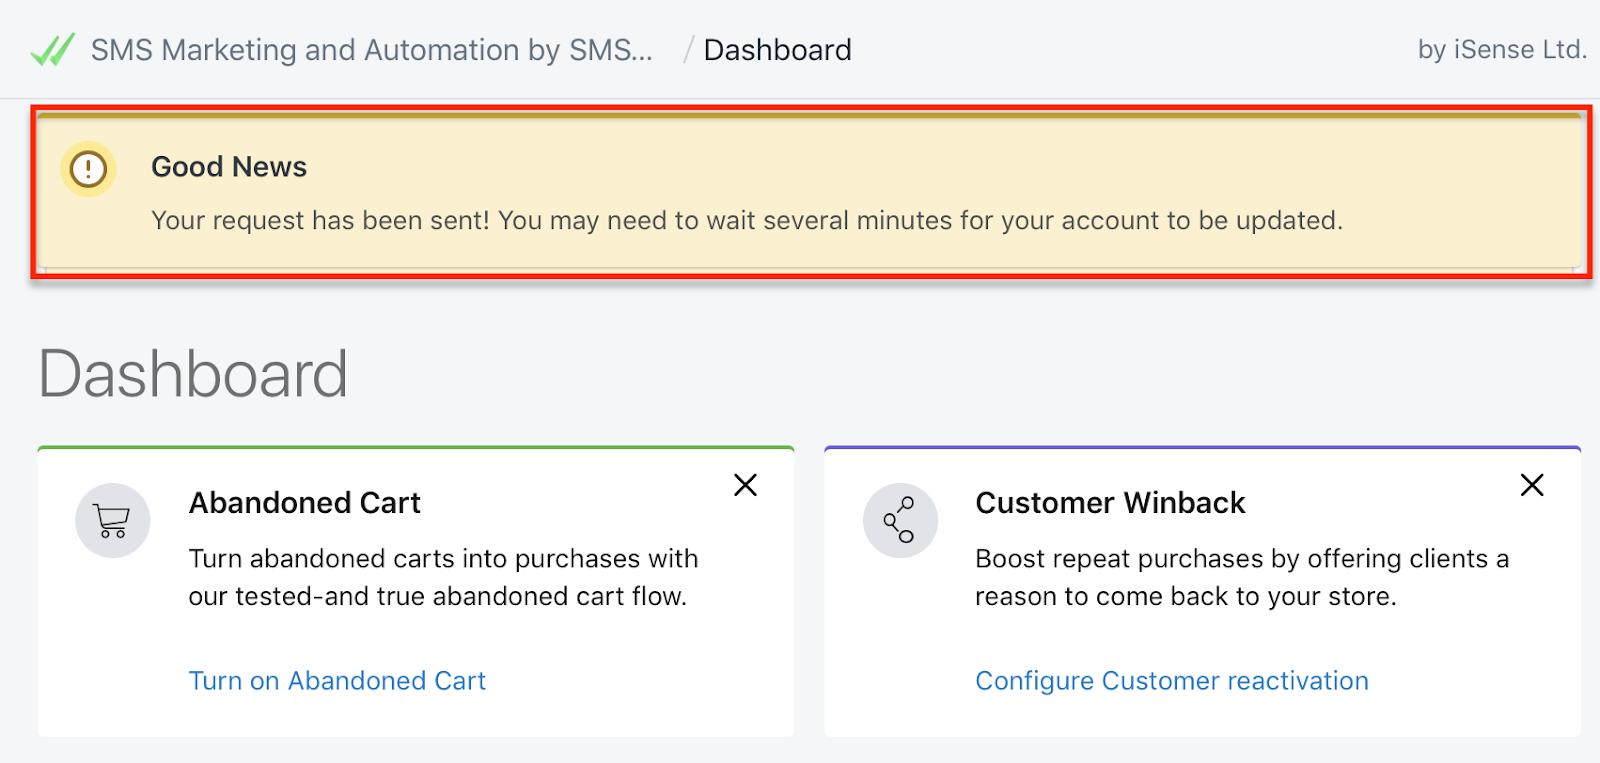 good_news_request_sent_keyword_SMSBump